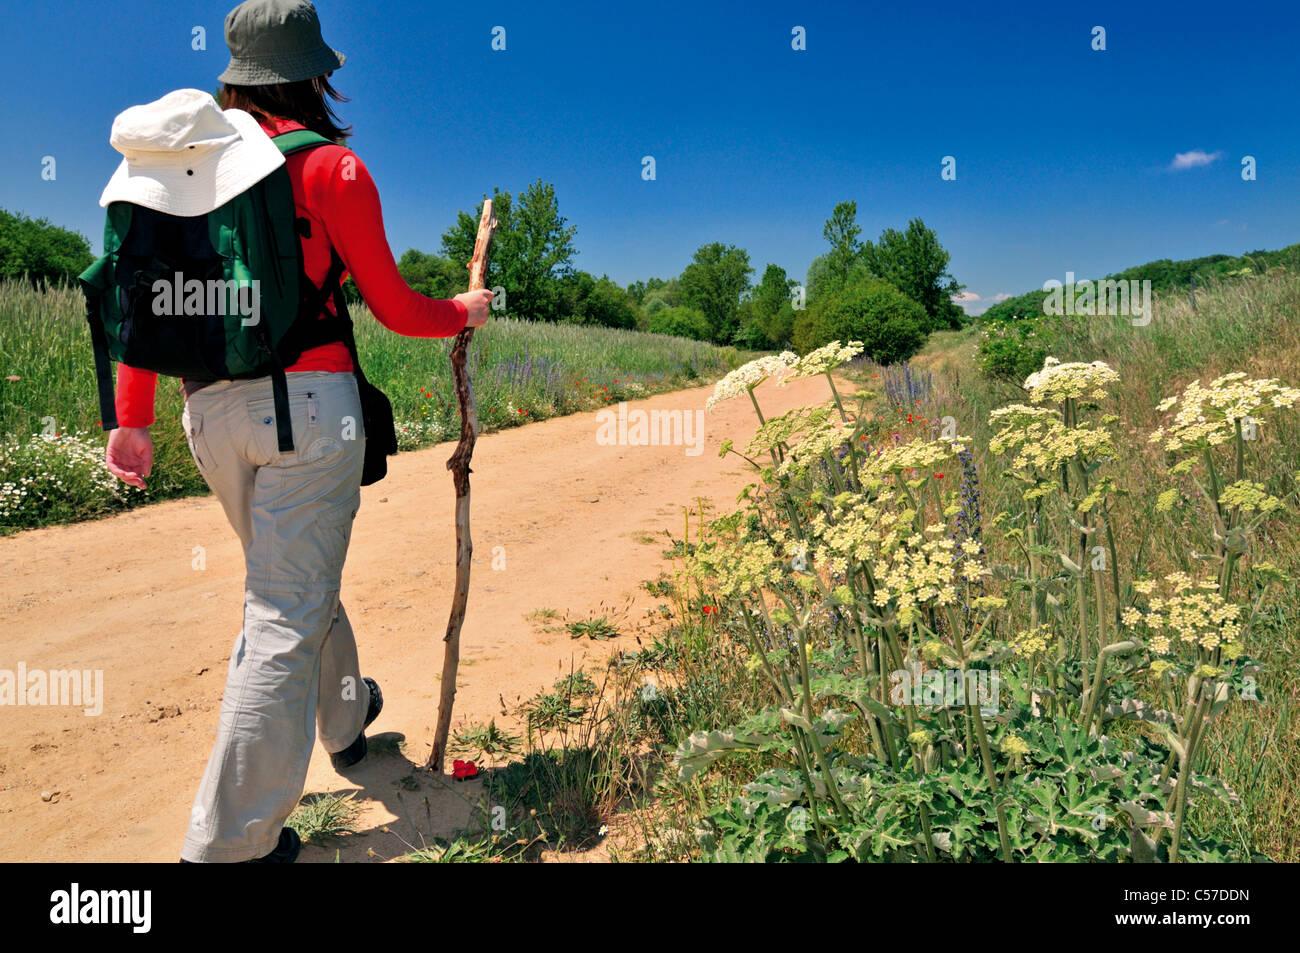 Spain, St. James Way: Pilgrim on the way to San Juan de Ortega at the Camino Frances - Stock Image